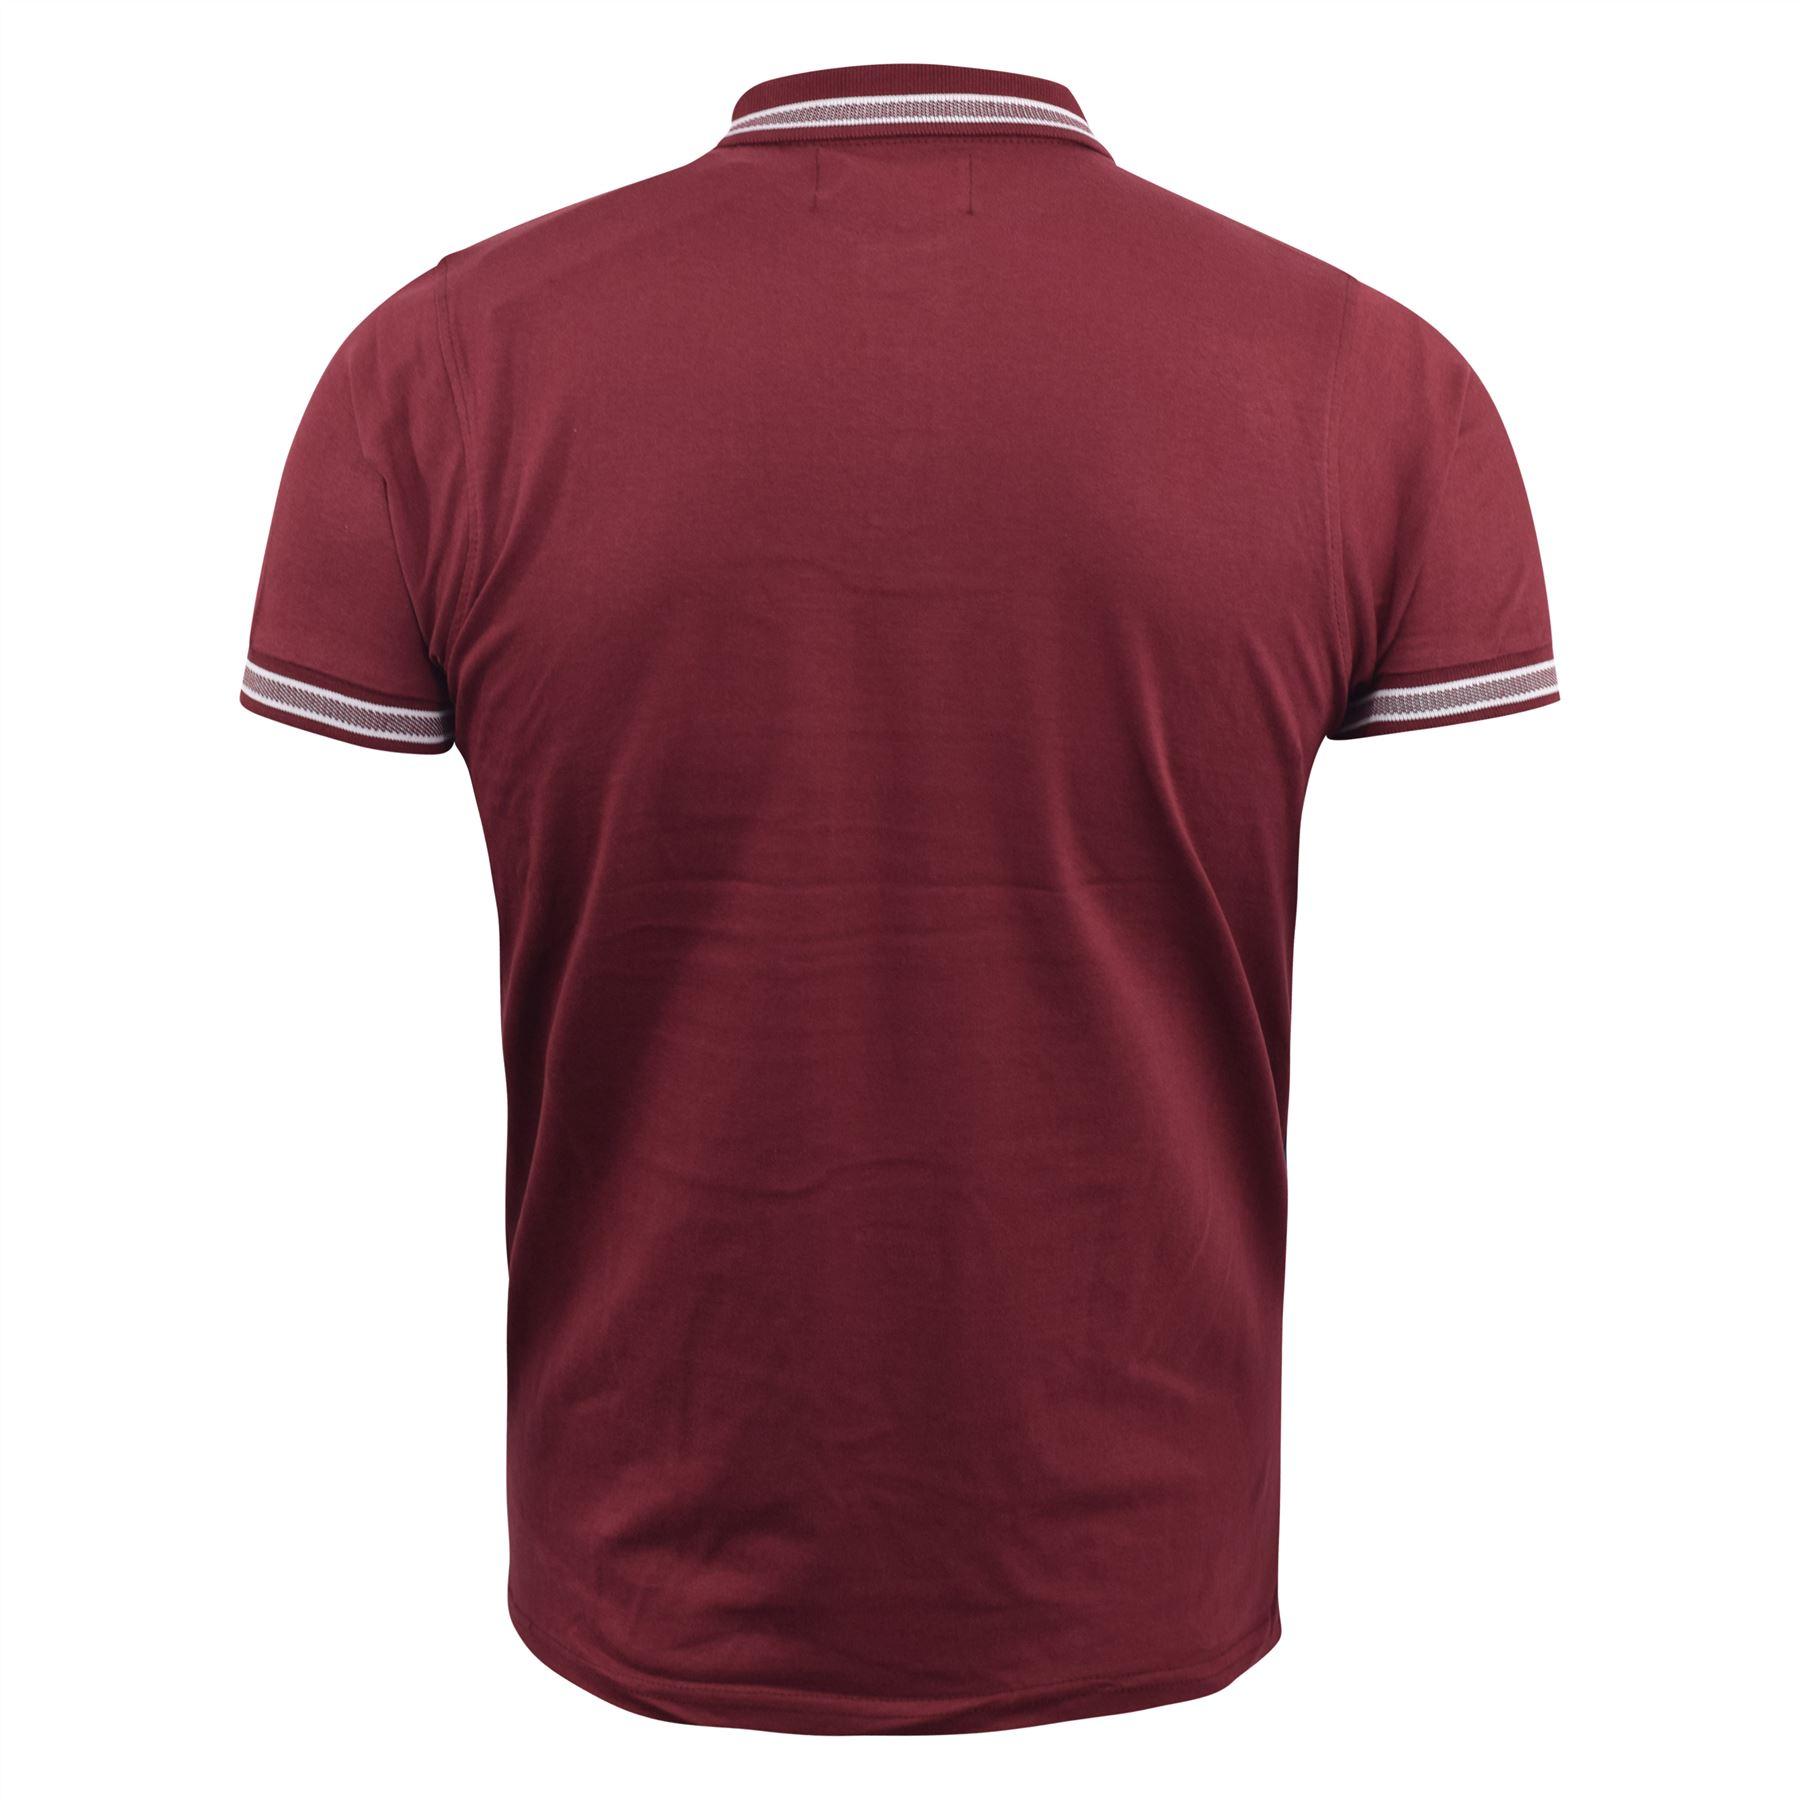 Mens-Polo-Shirt-kangol-Short-Sleeve-T-Shirt-Top-West thumbnail 5